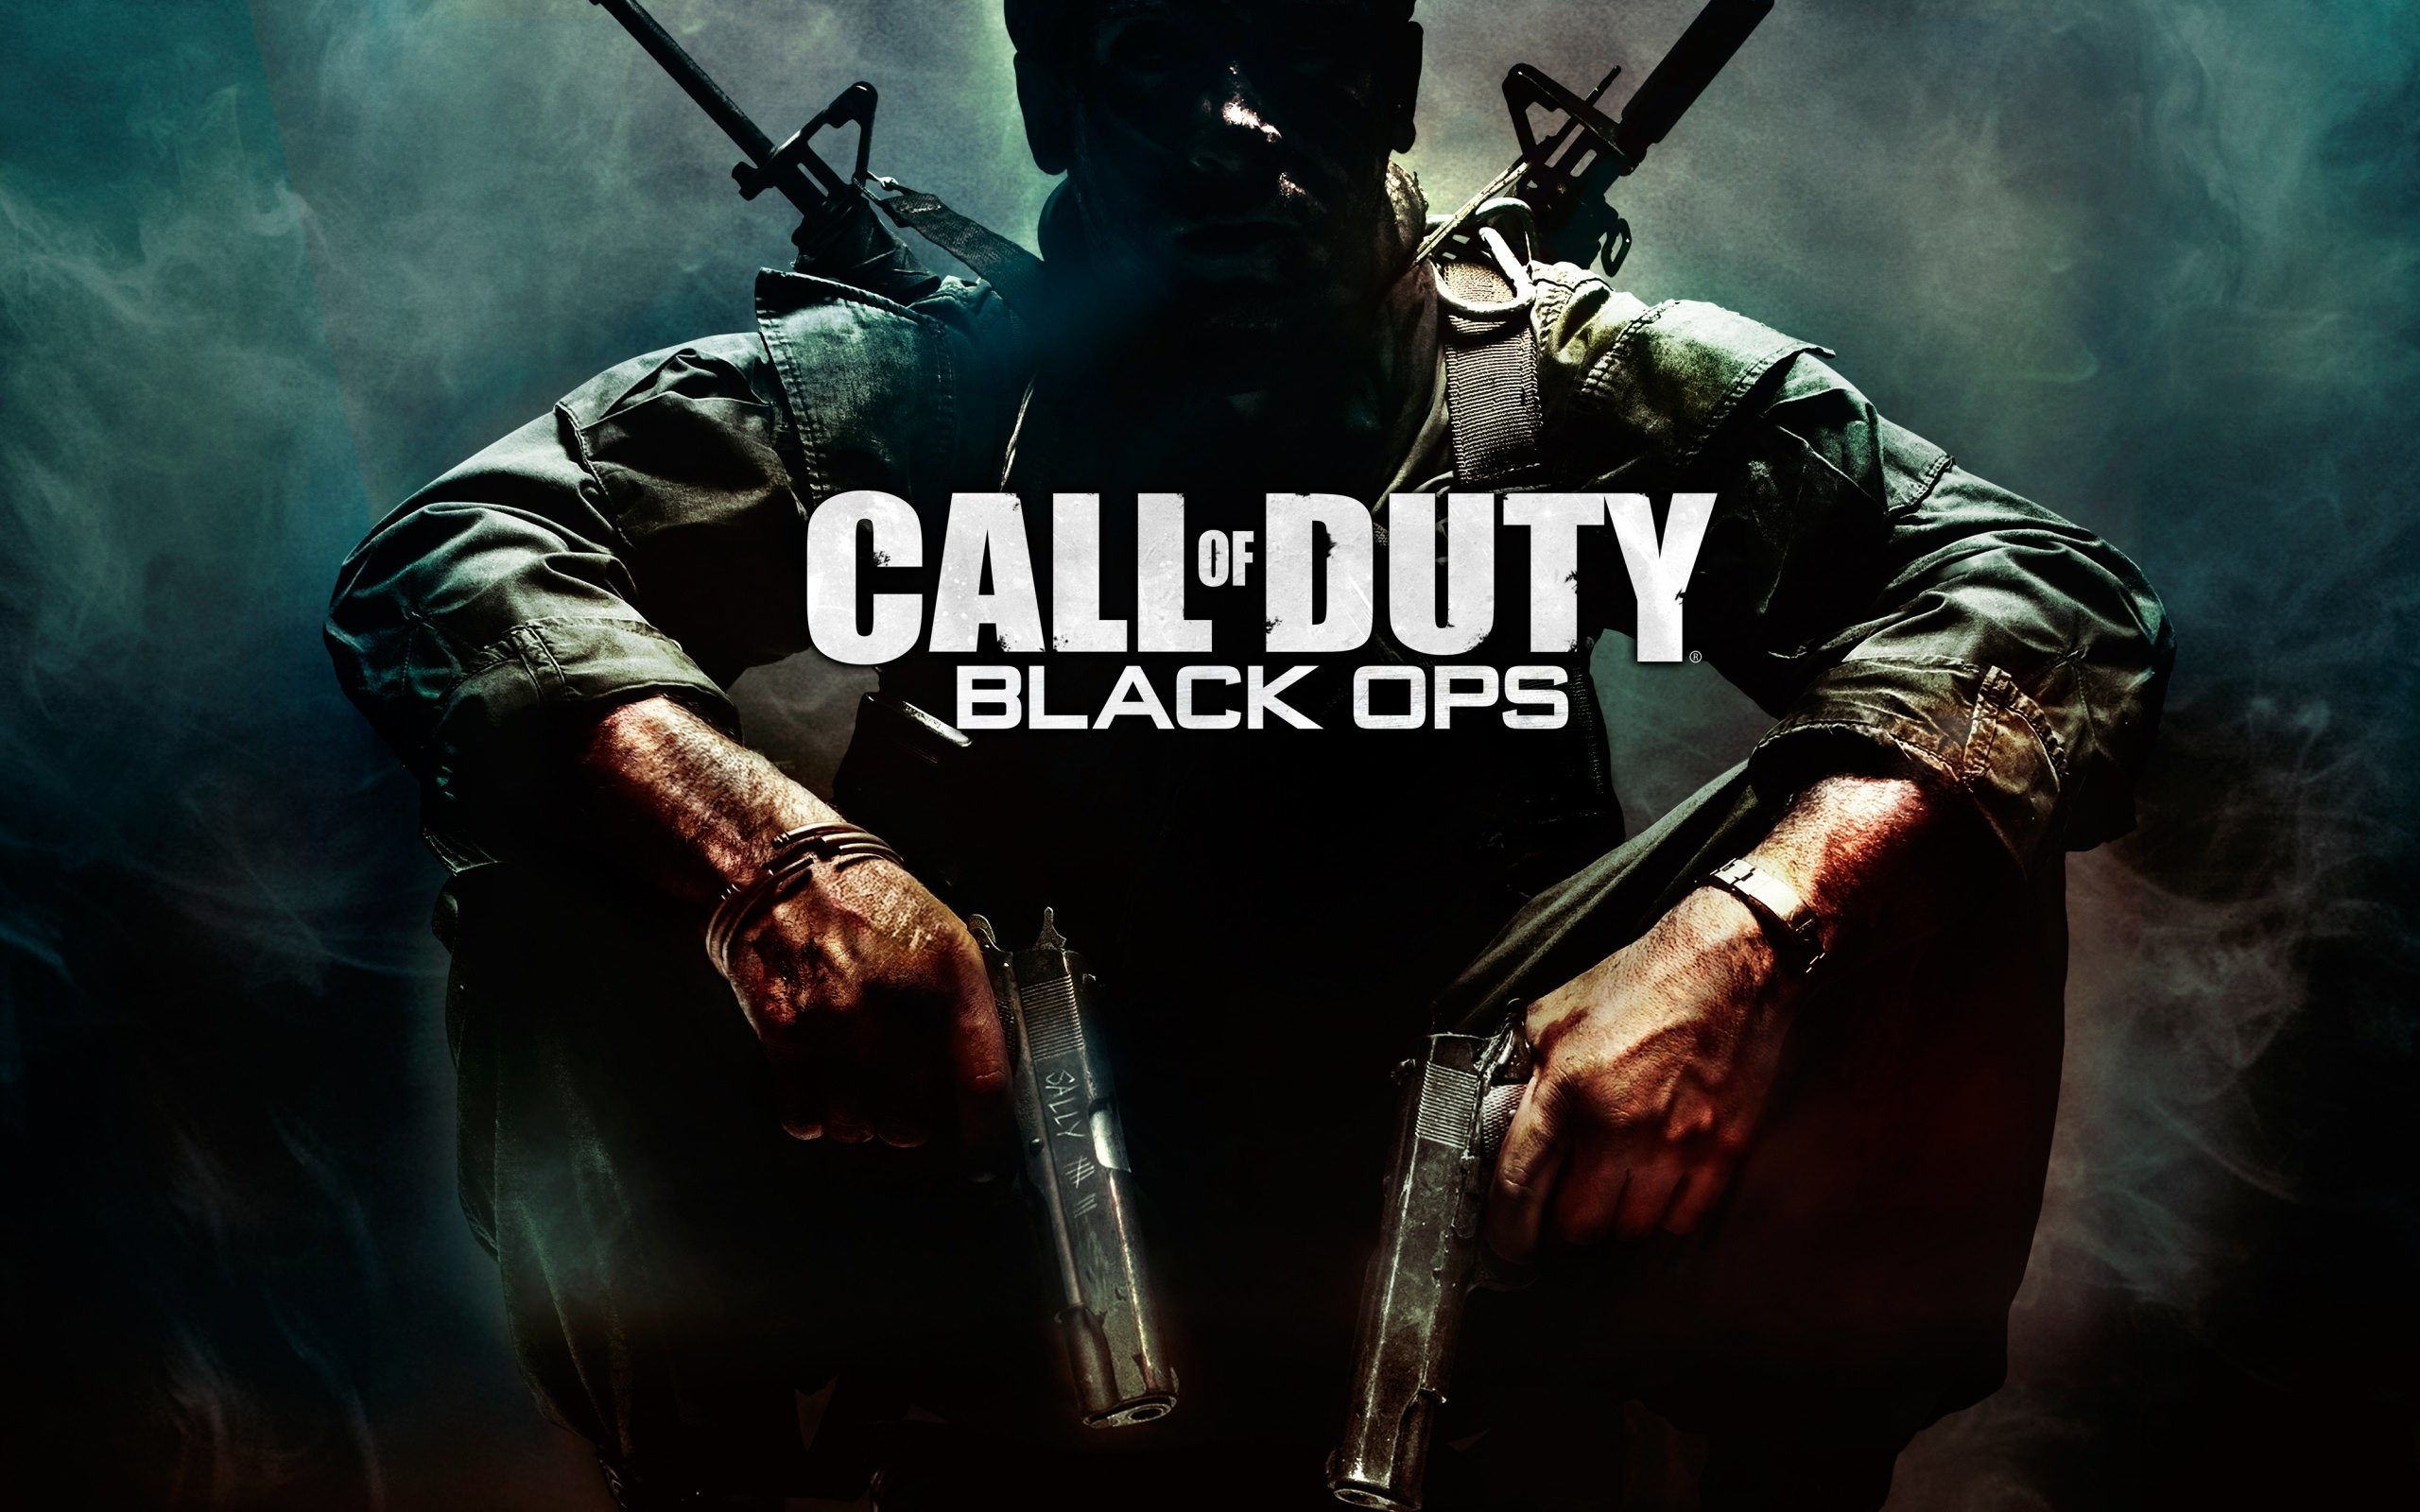 Call of Duty Wallpaper · HD Wallpapers · 4k gaming …